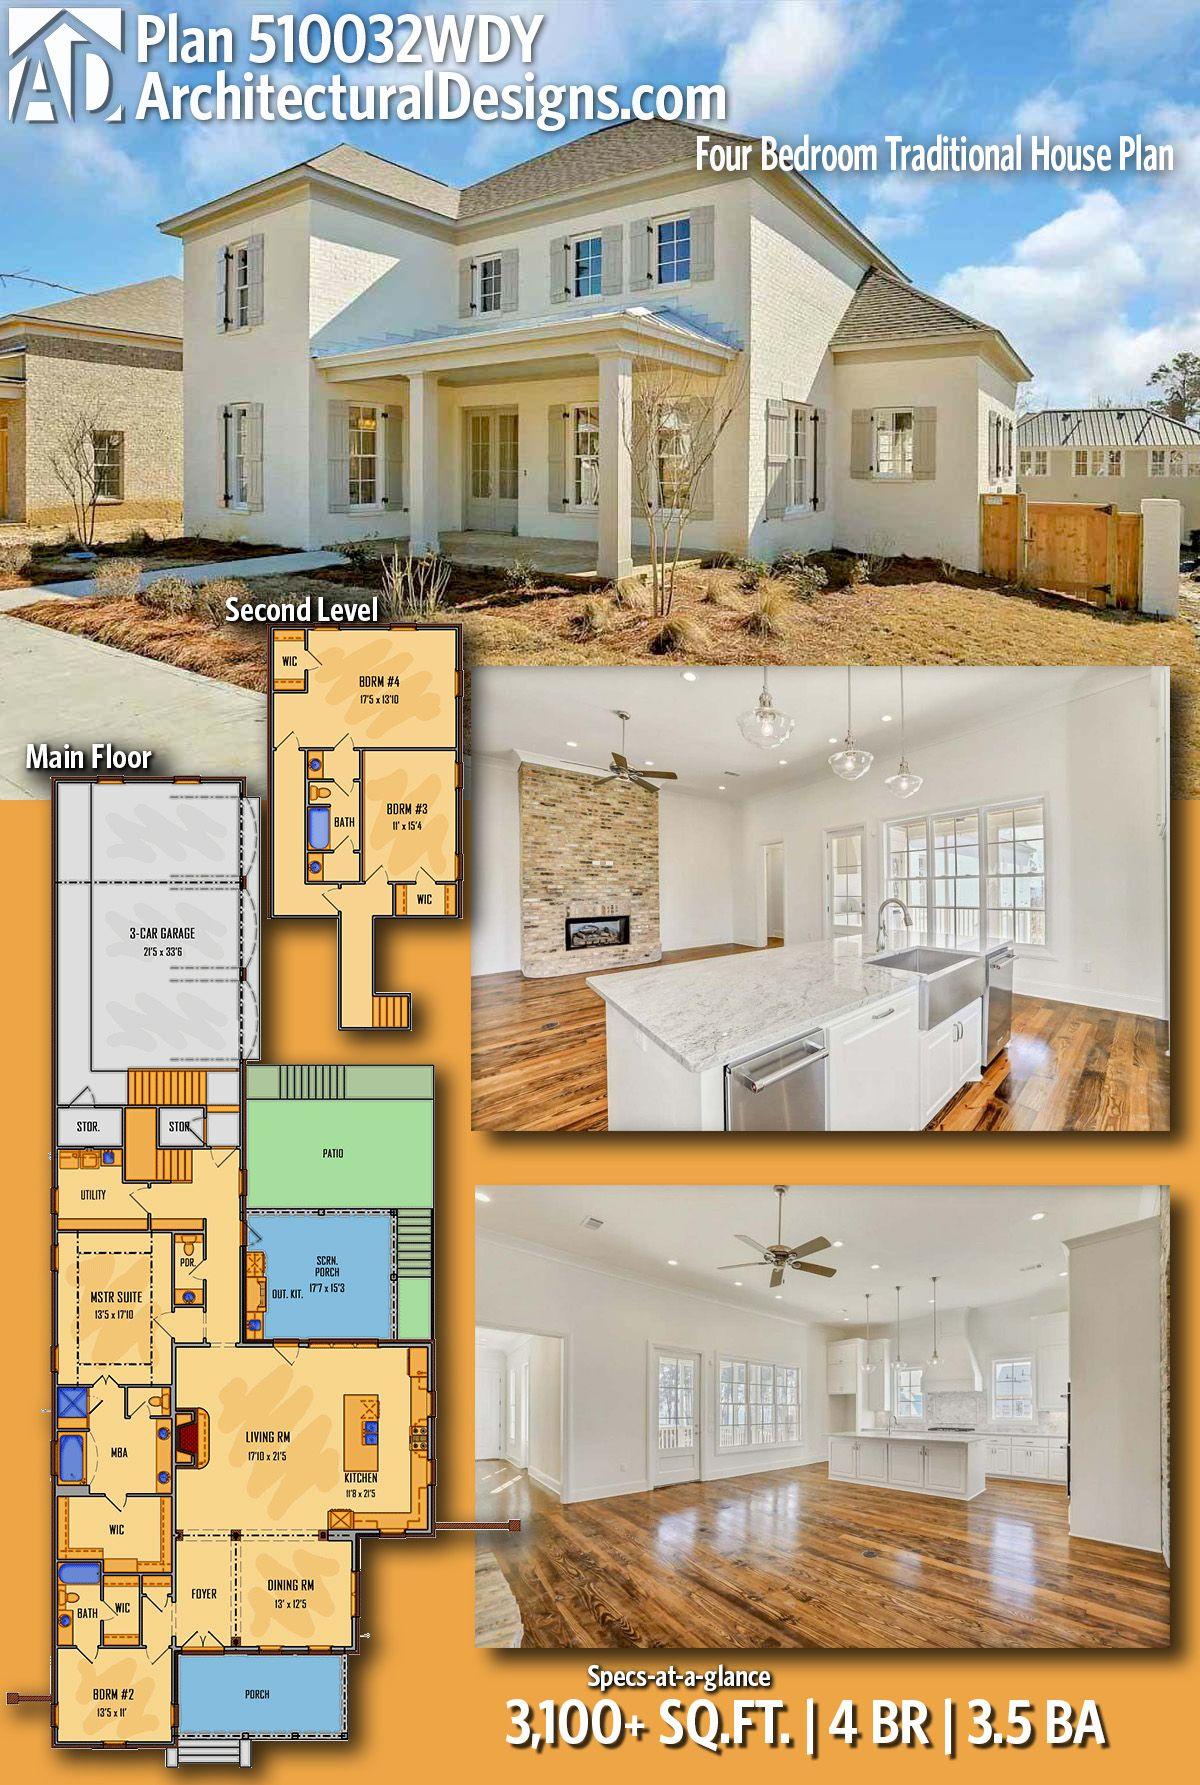 Architectural Designs House Plan 510032WDY 4